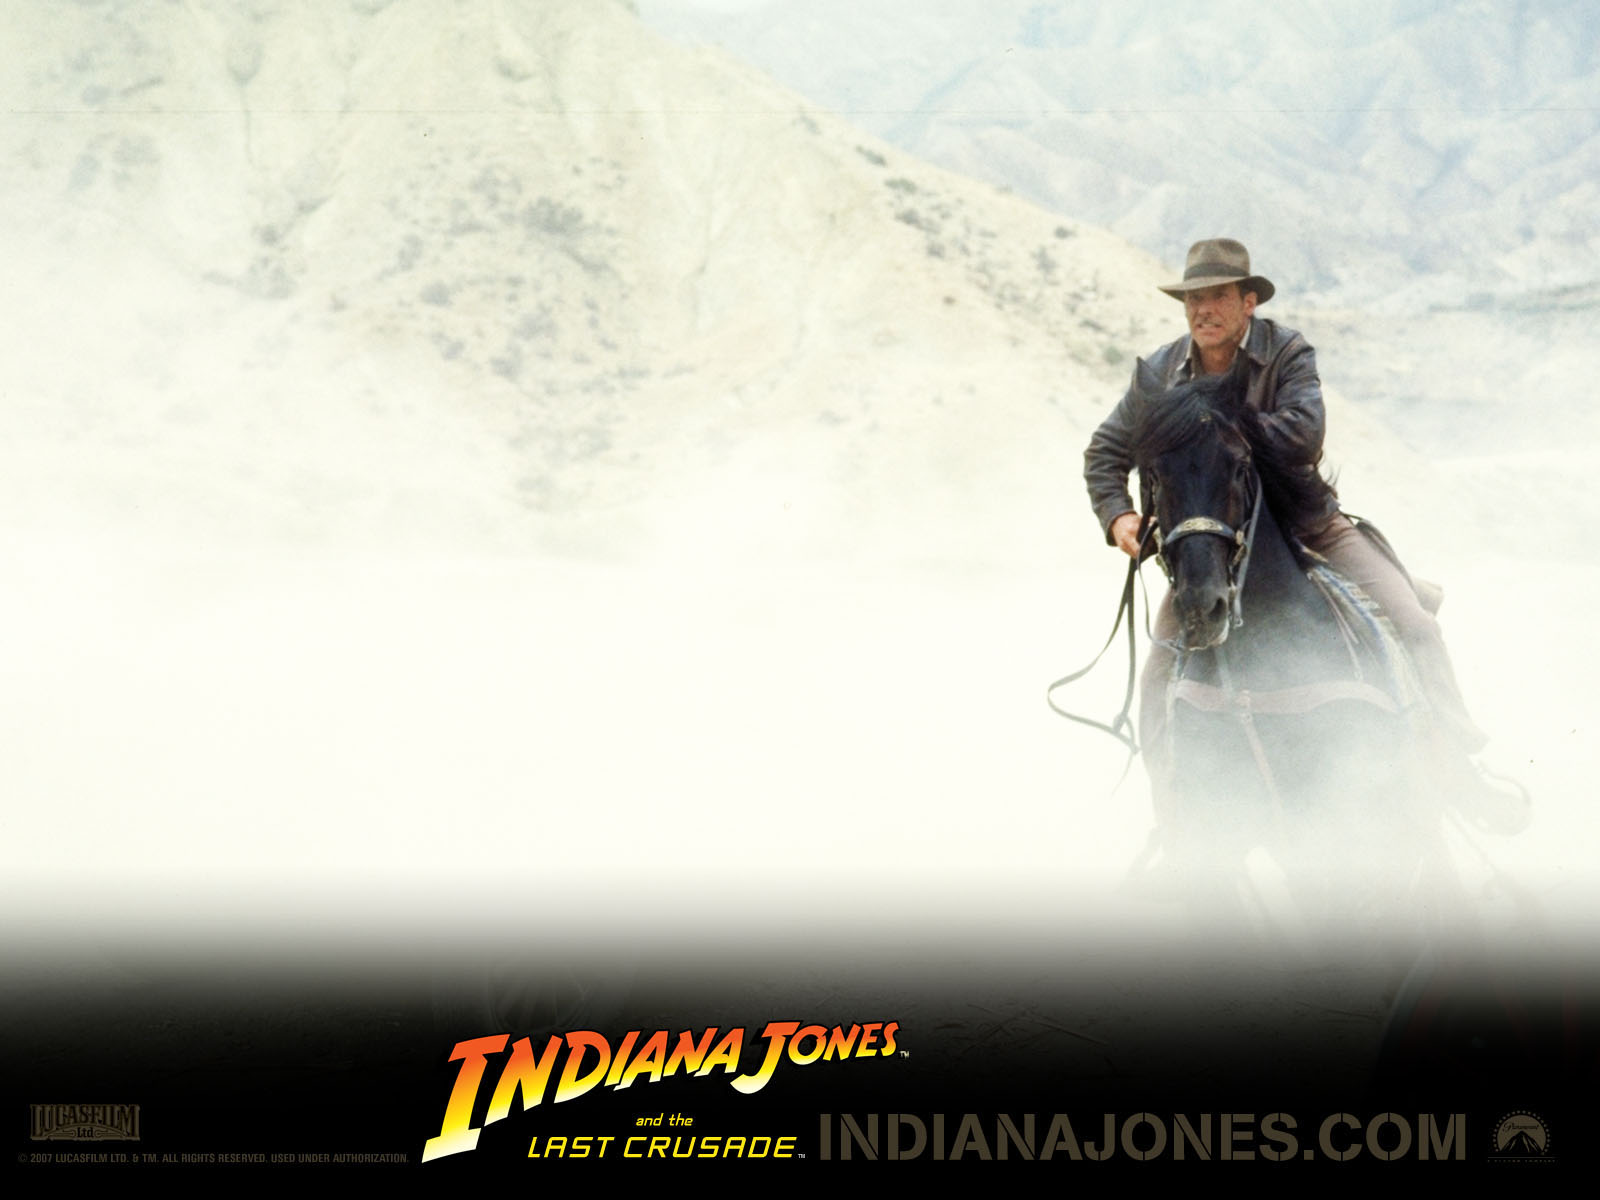 Wallpaper Indiana Jones Indiana Jones and the Last Crusade Movies film